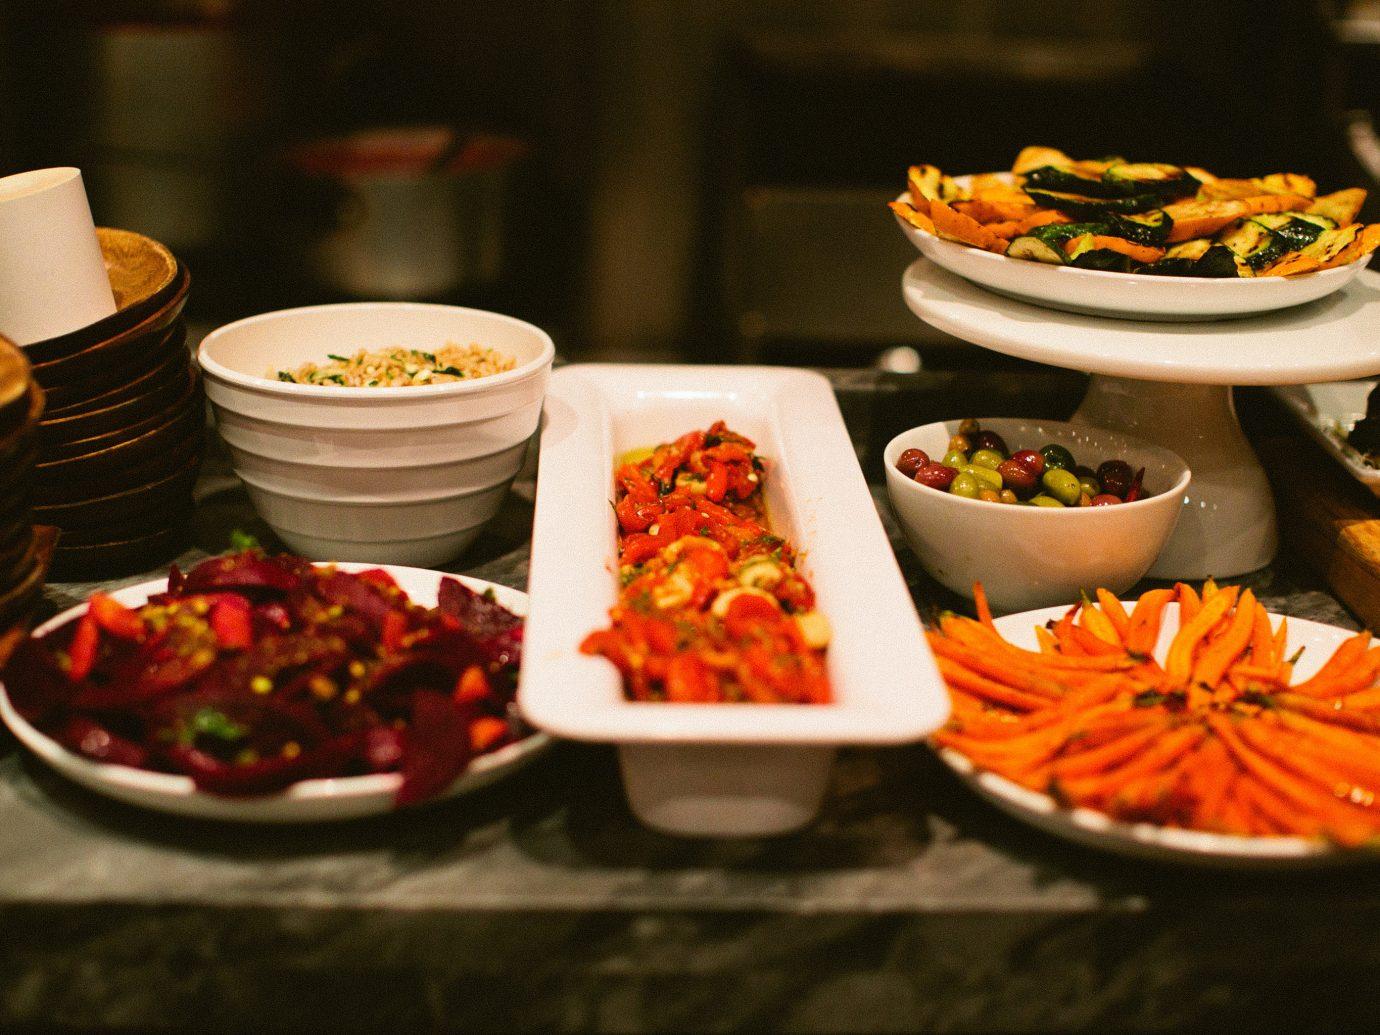 Food + Drink food plate meal indoor bowl dish buffet cuisine supper brunch sense dinner asian food lunch different several sliced